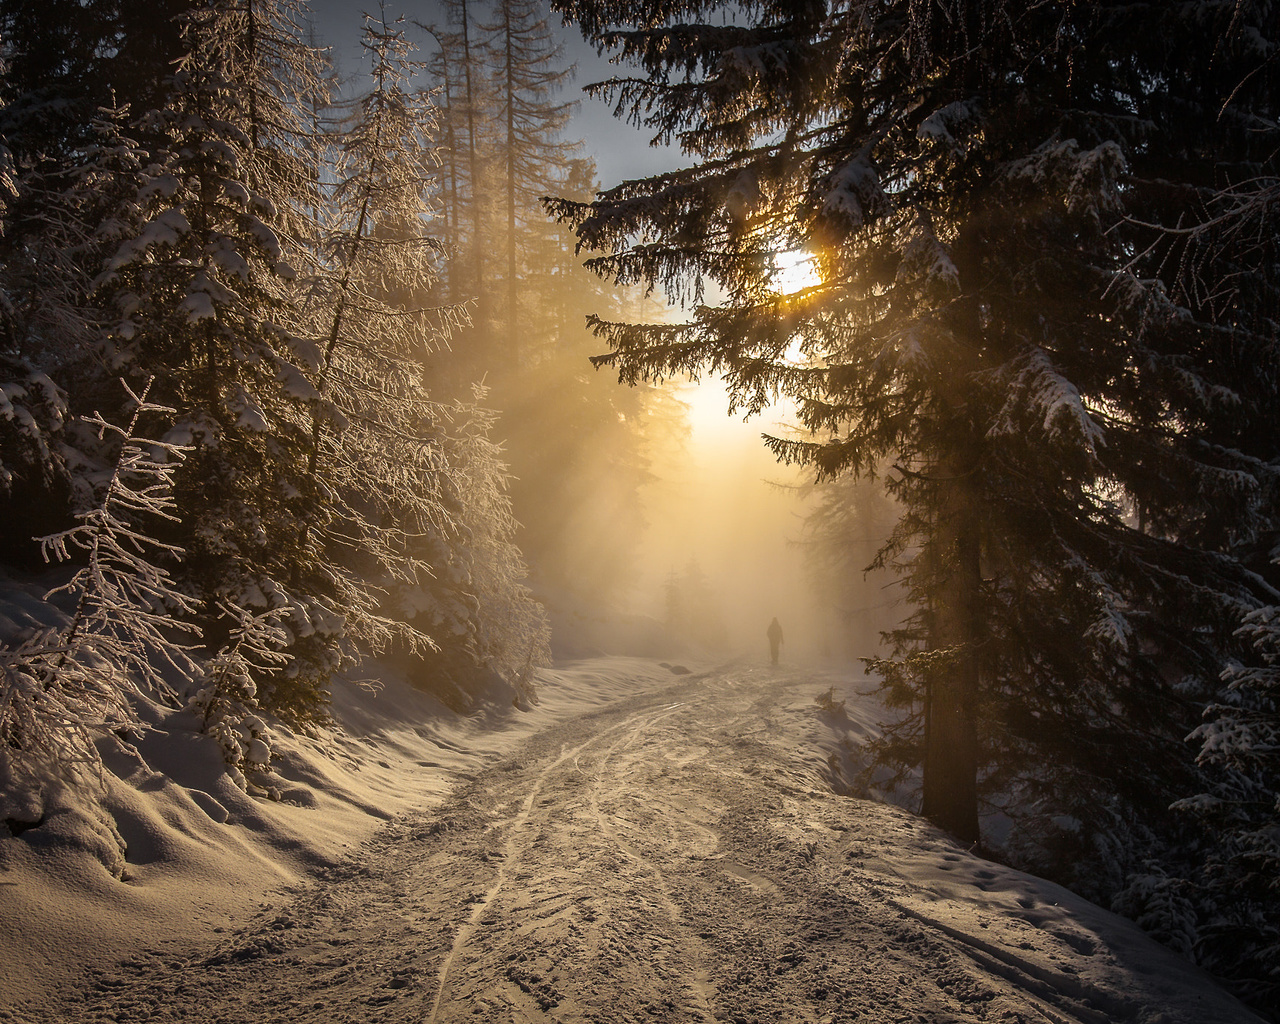 torsten muehlbacher, природа, зима, снег, лес, деревья, ели, дорога, солнце, свет